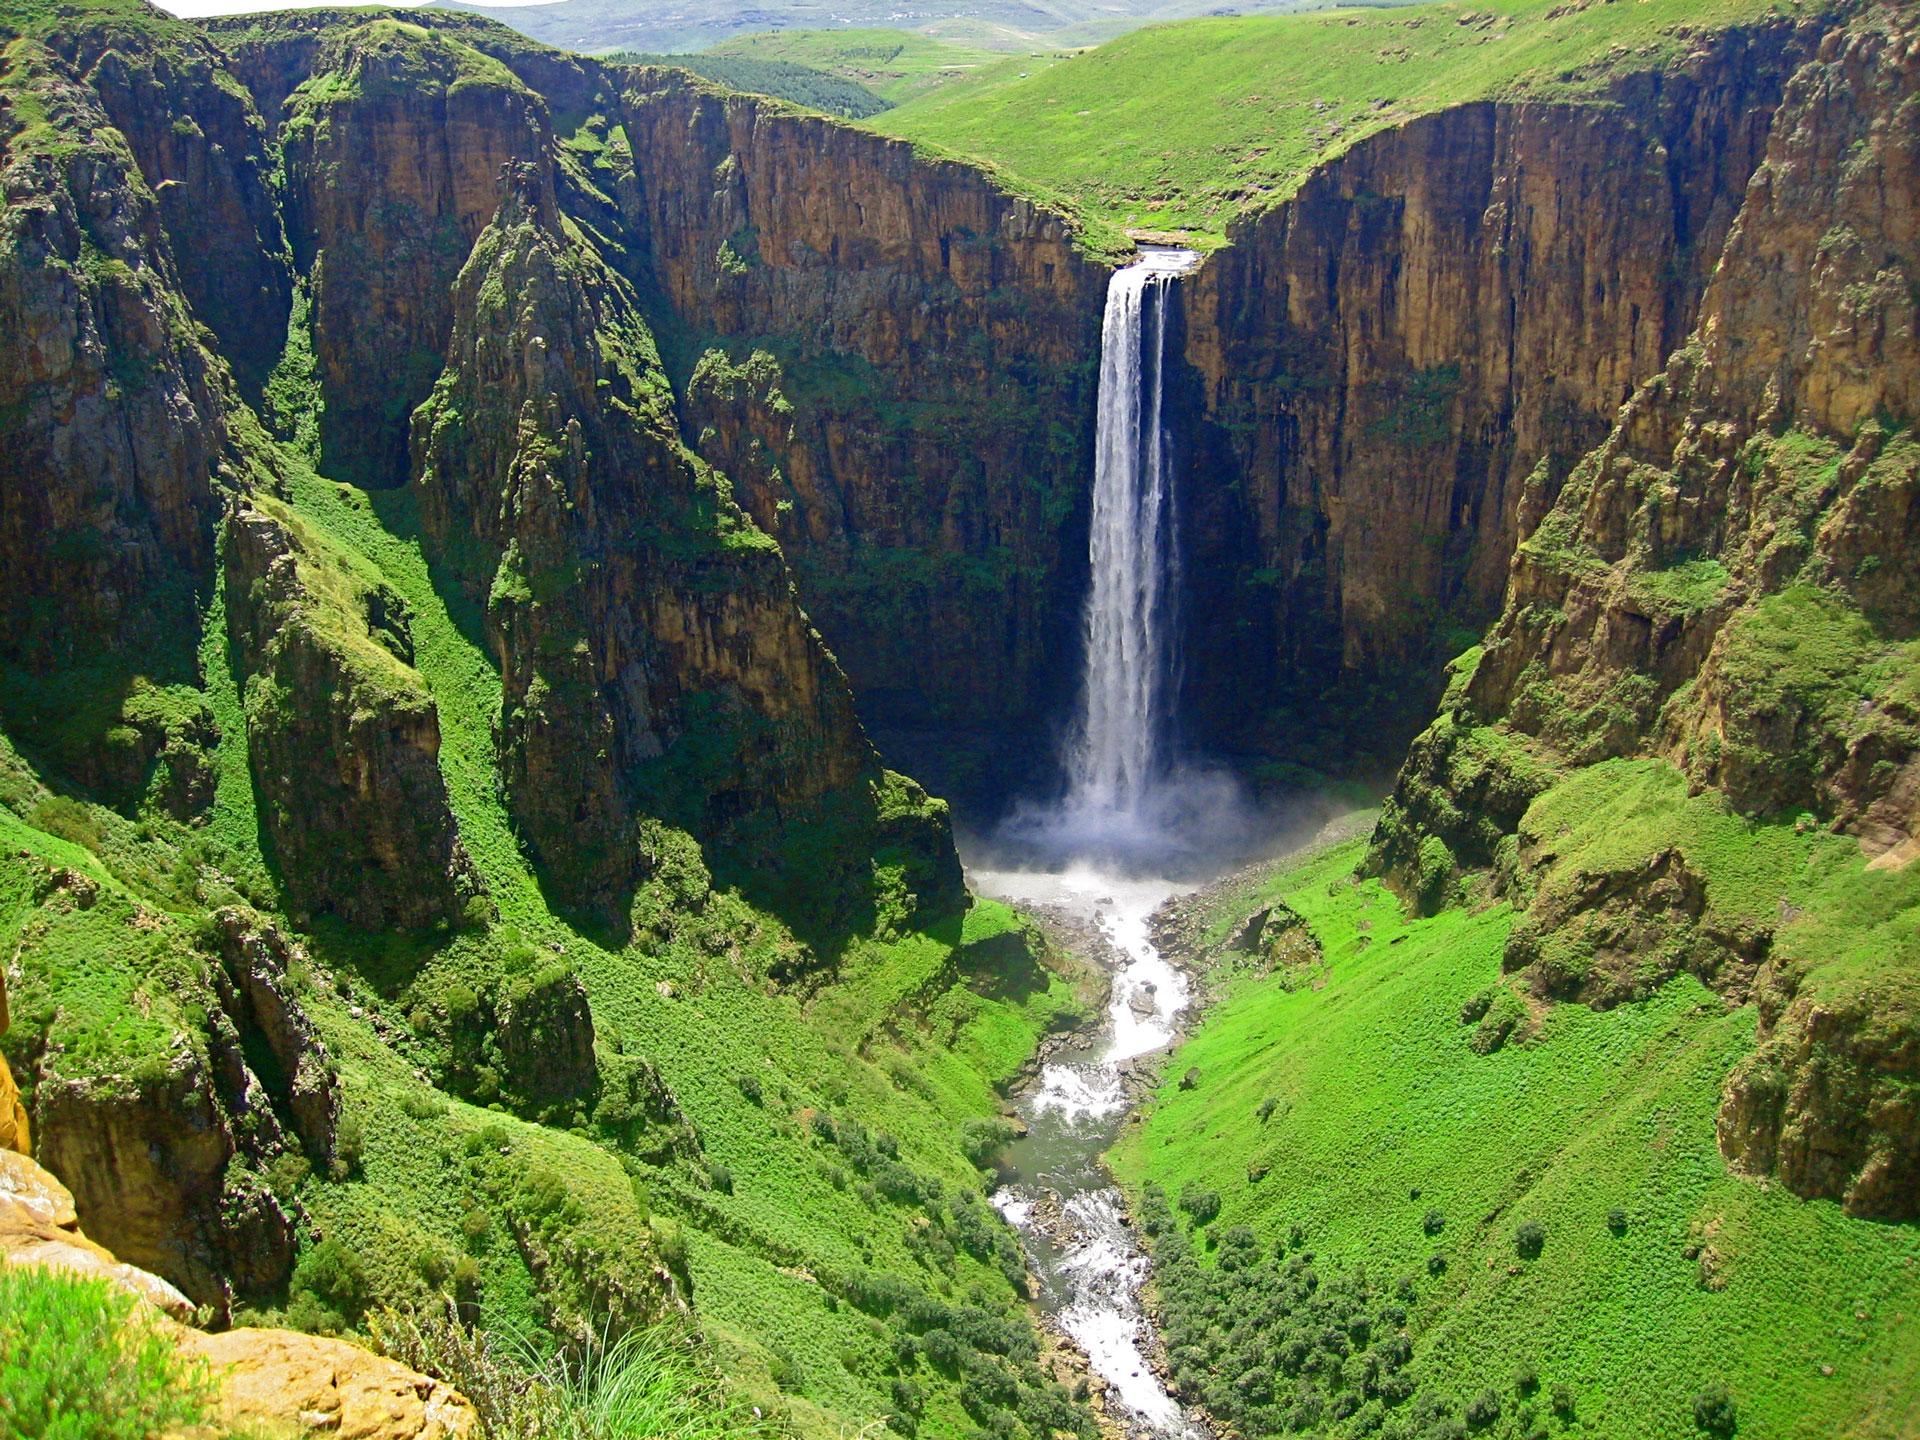 Maletsunyane-falls-baratos-WishandFly-viaje-sorpresa